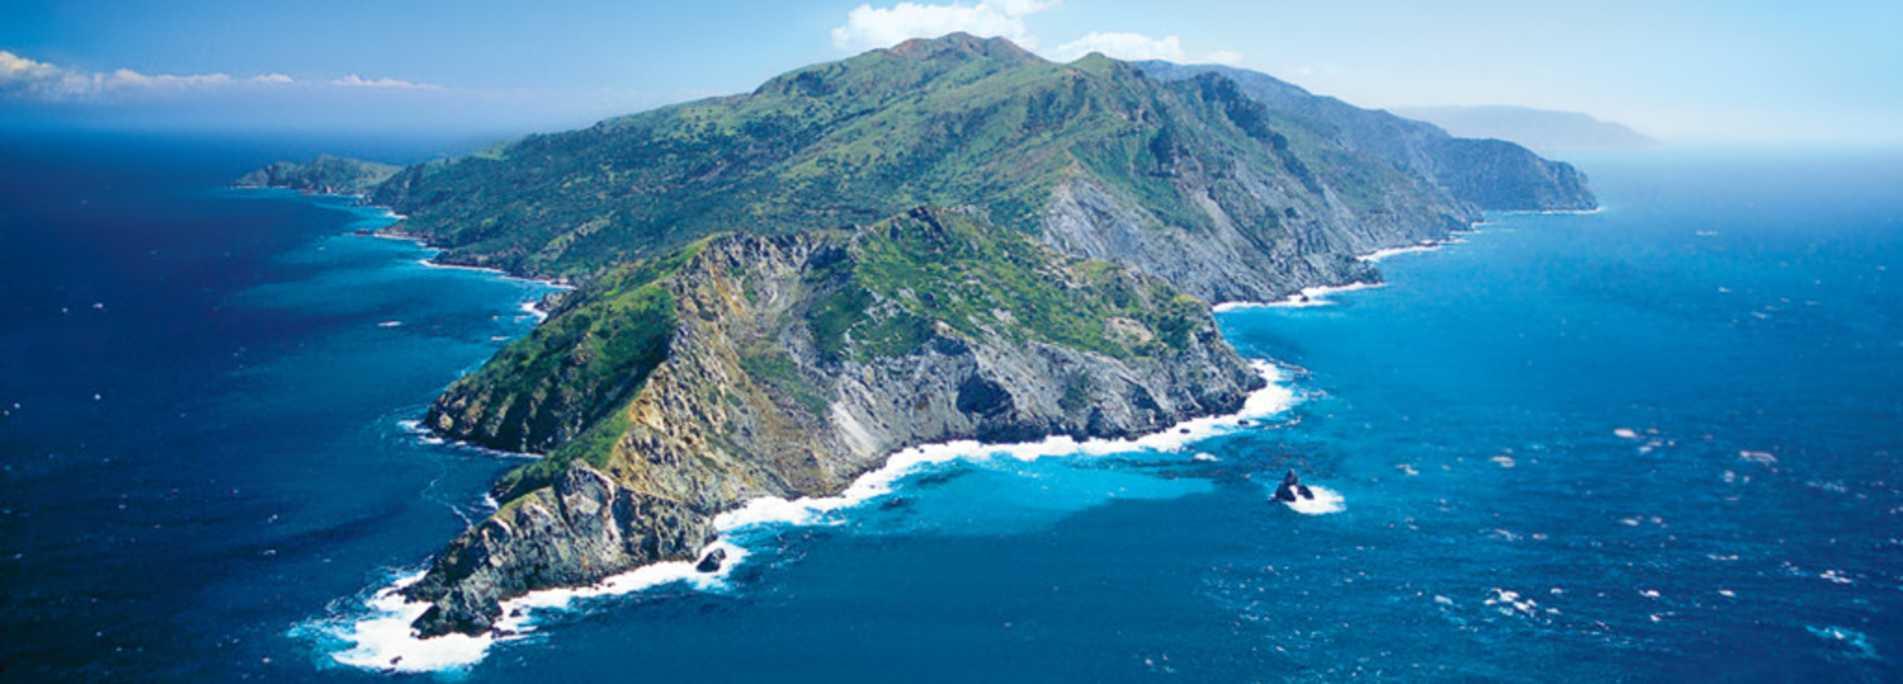 where is catalina island